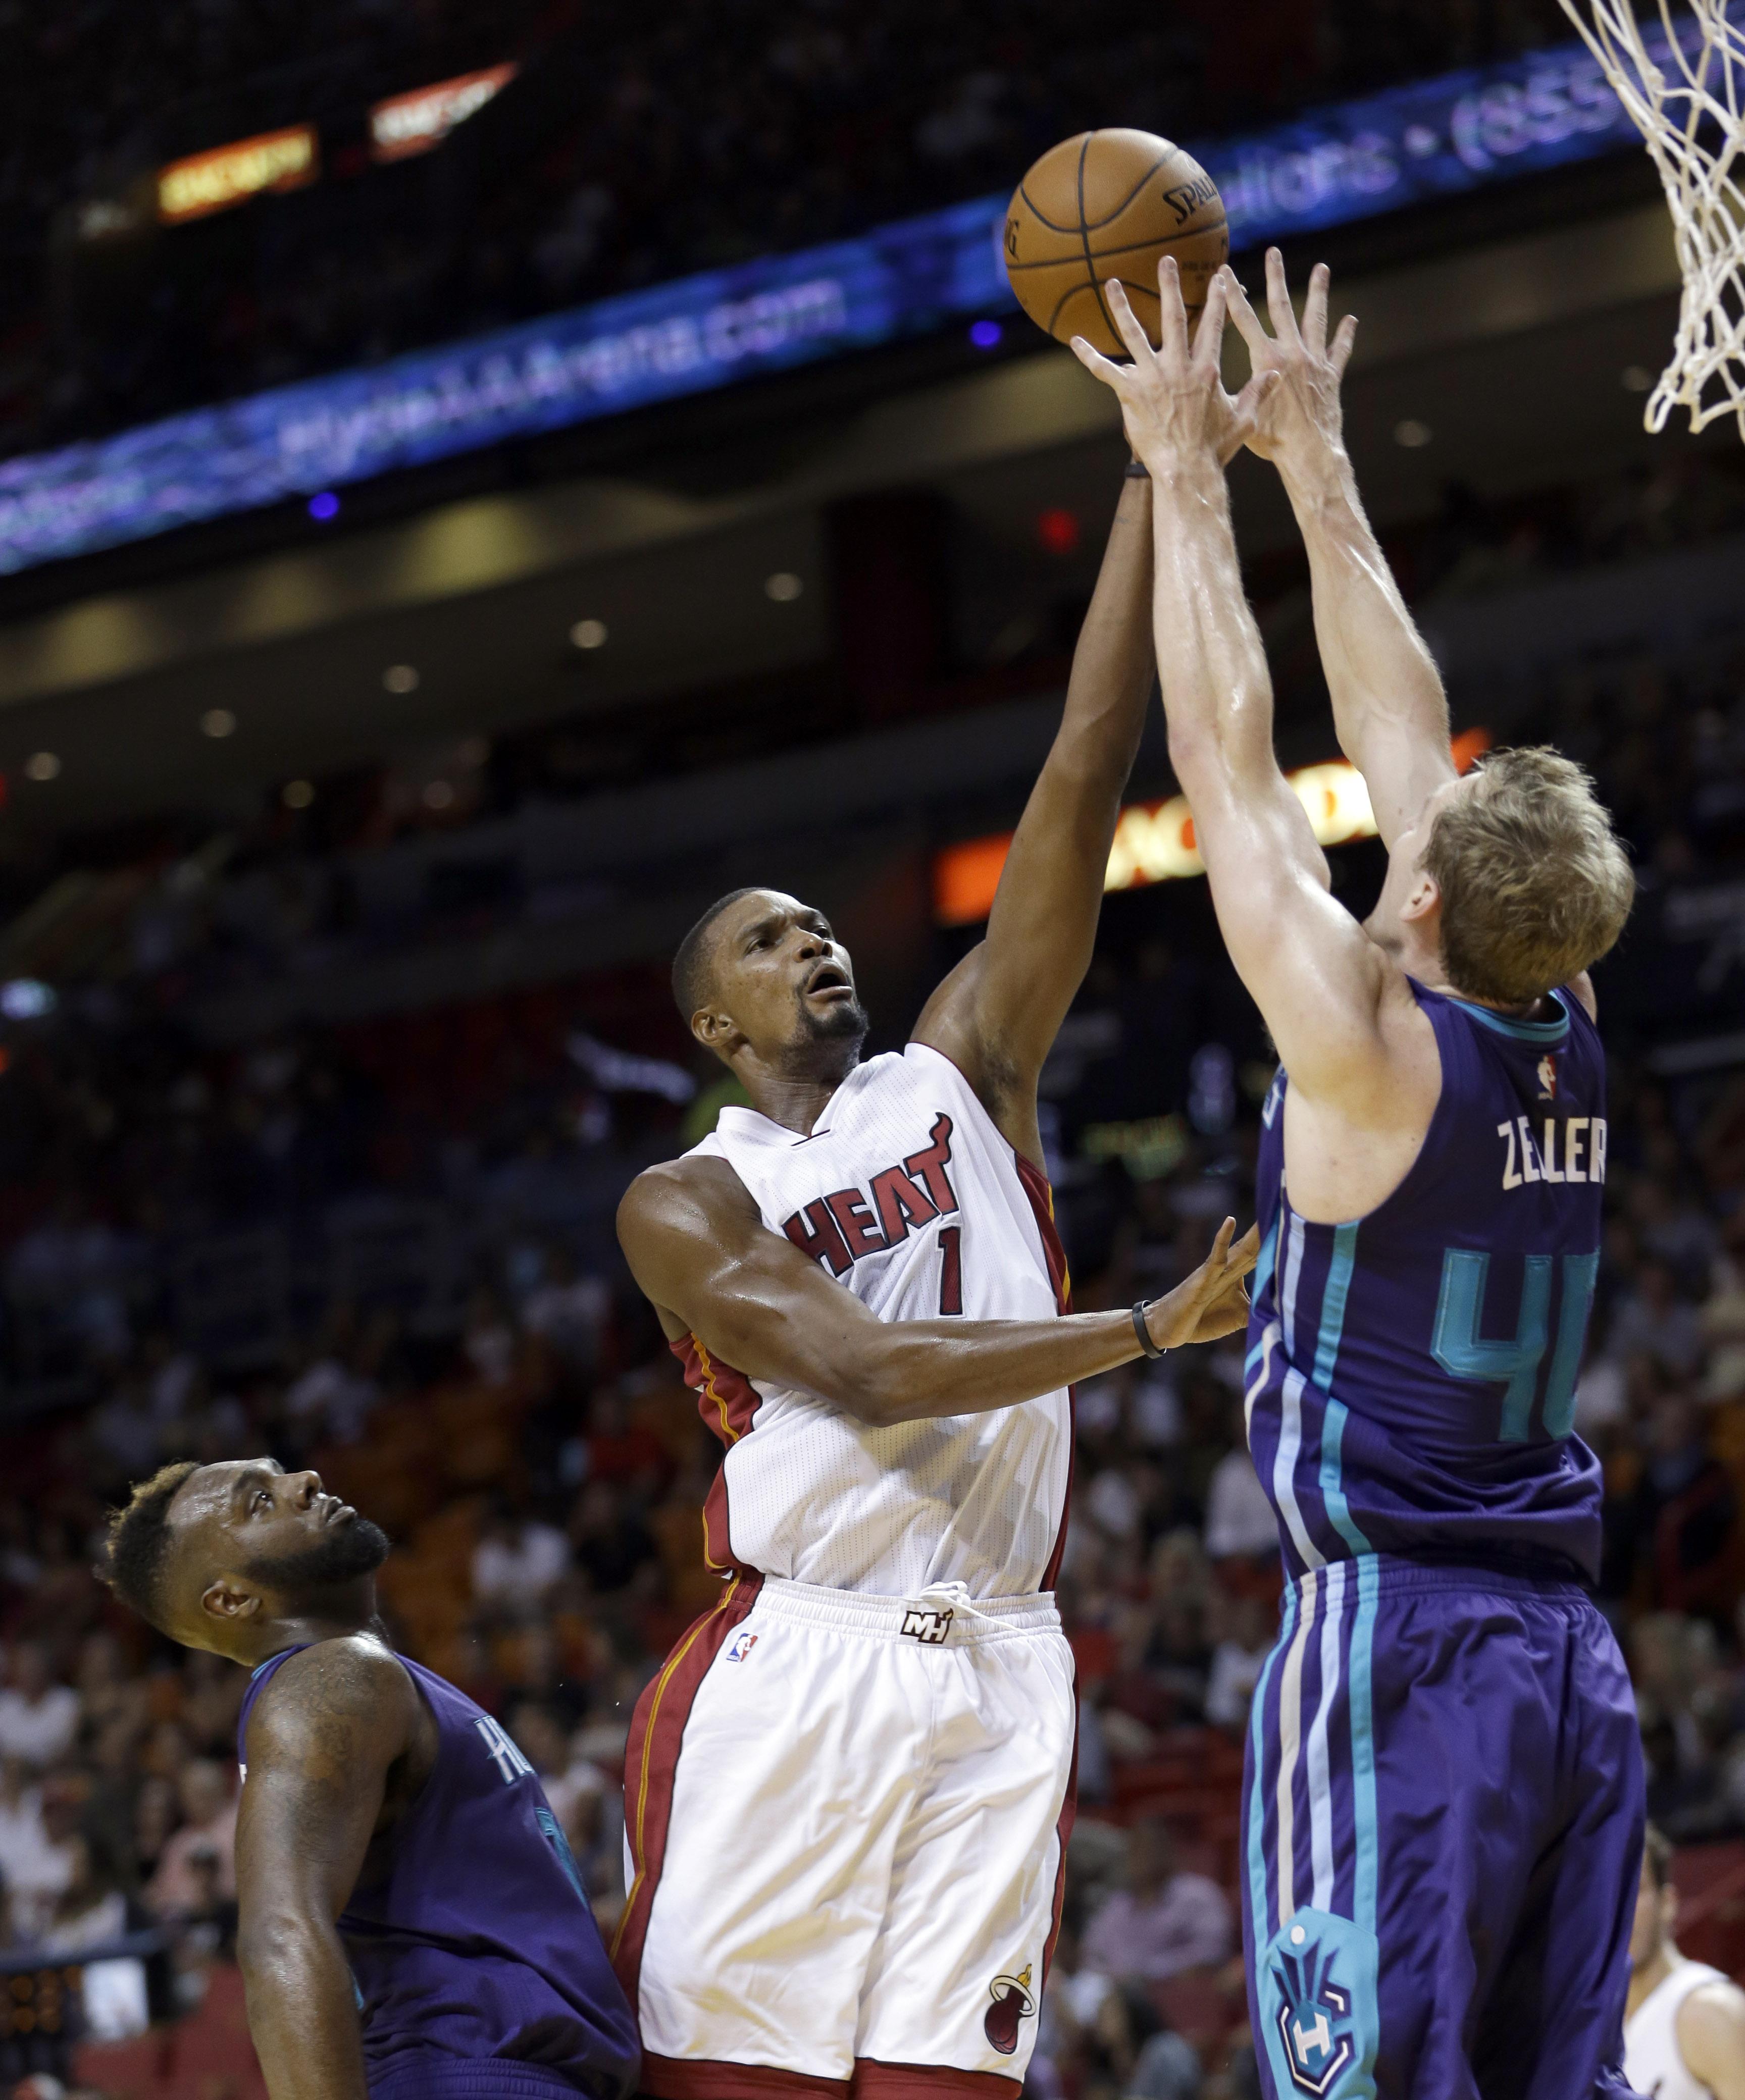 Miami Heat forward Chris Bosh (1) shoots against Charlotte Hornets forward Cody Zeller (40) in the first half of an NBA preseason basketball game, Sunday, Oct. 4, 2015, in Miami. The Hornets won 90-77. (AP Photo/Alan Diaz)